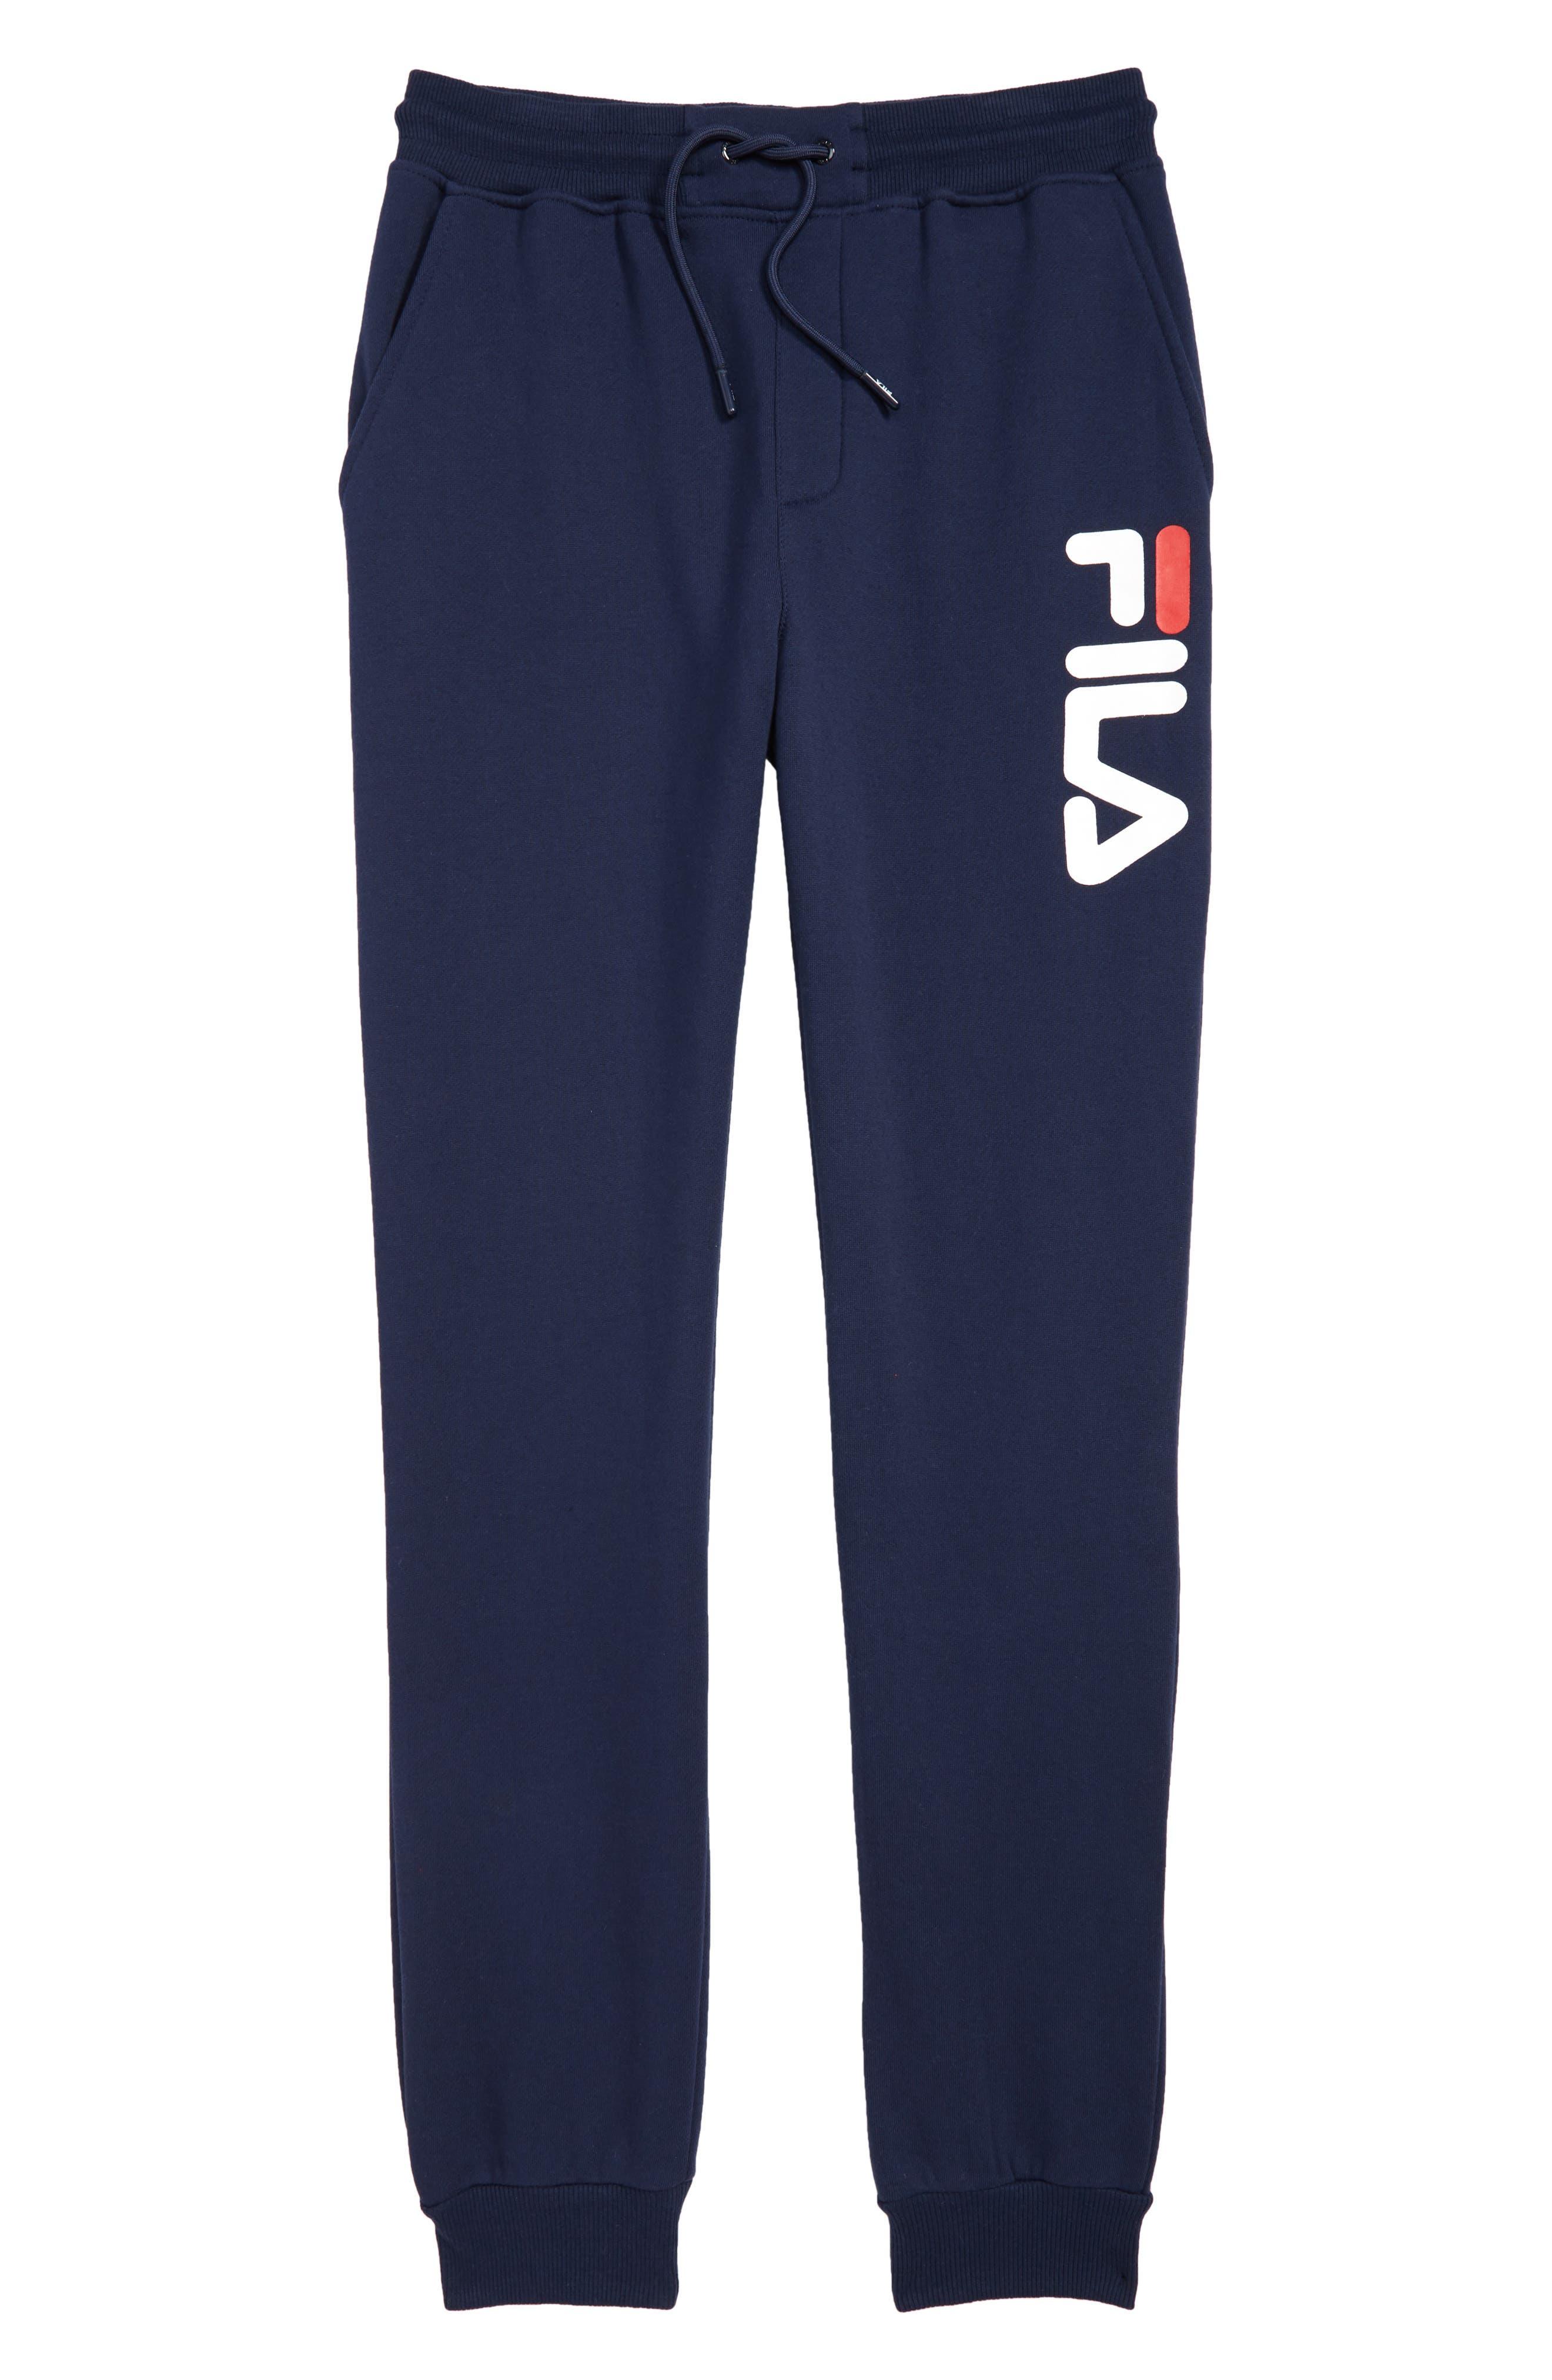 Boys Fila Classic Jogger Pants